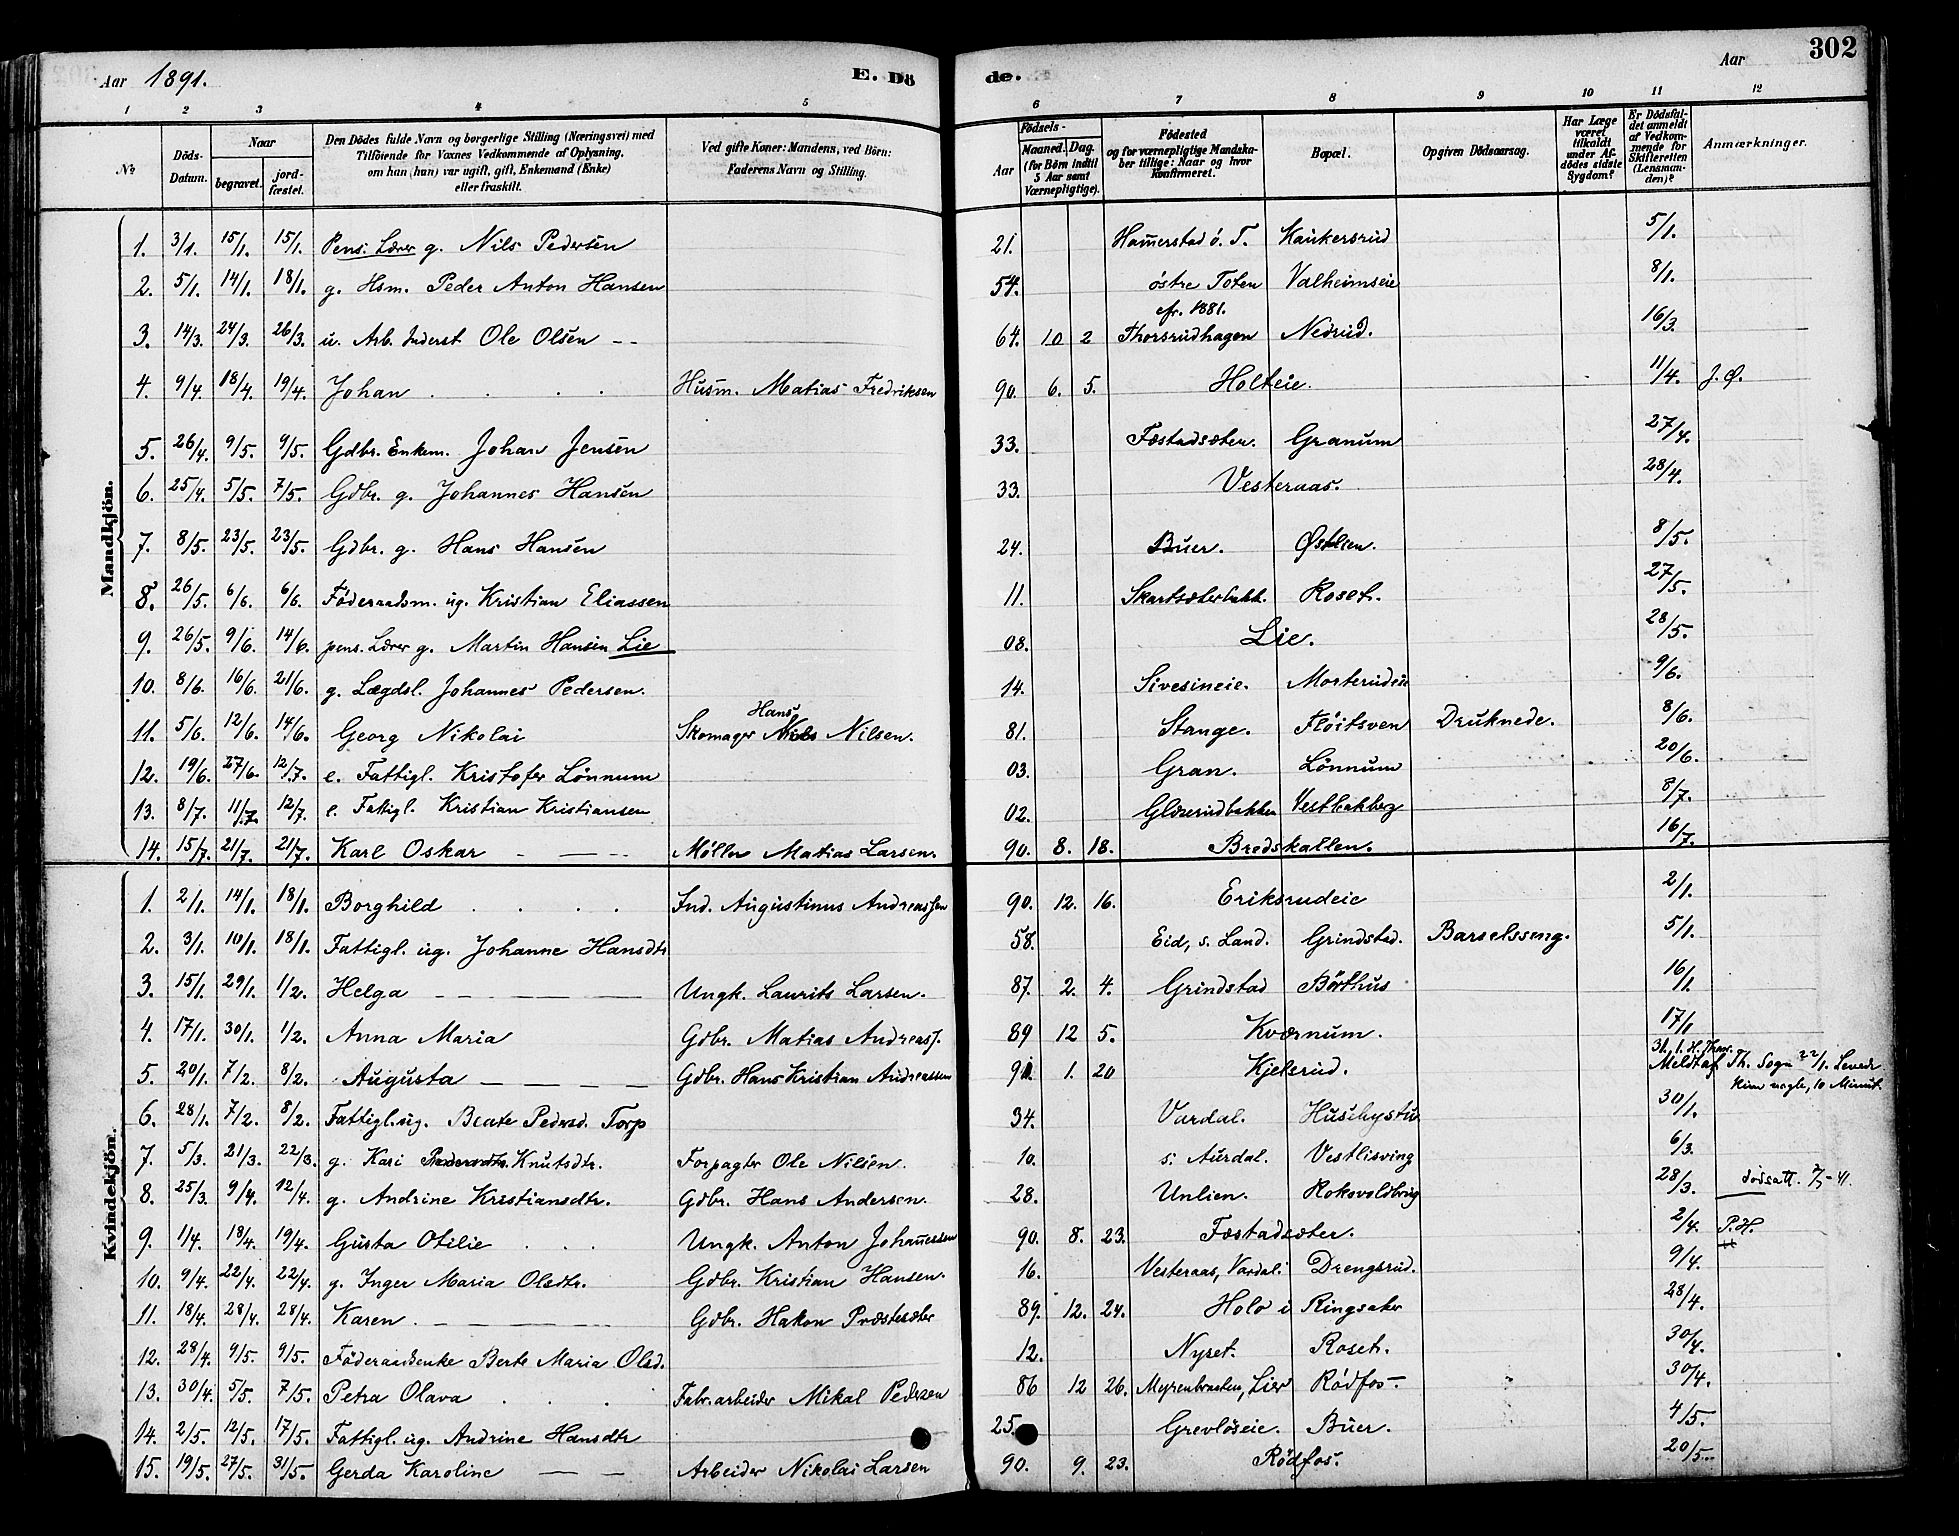 SAH, Vestre Toten prestekontor, H/Ha/Haa/L0009: Ministerialbok nr. 9, 1878-1894, s. 302